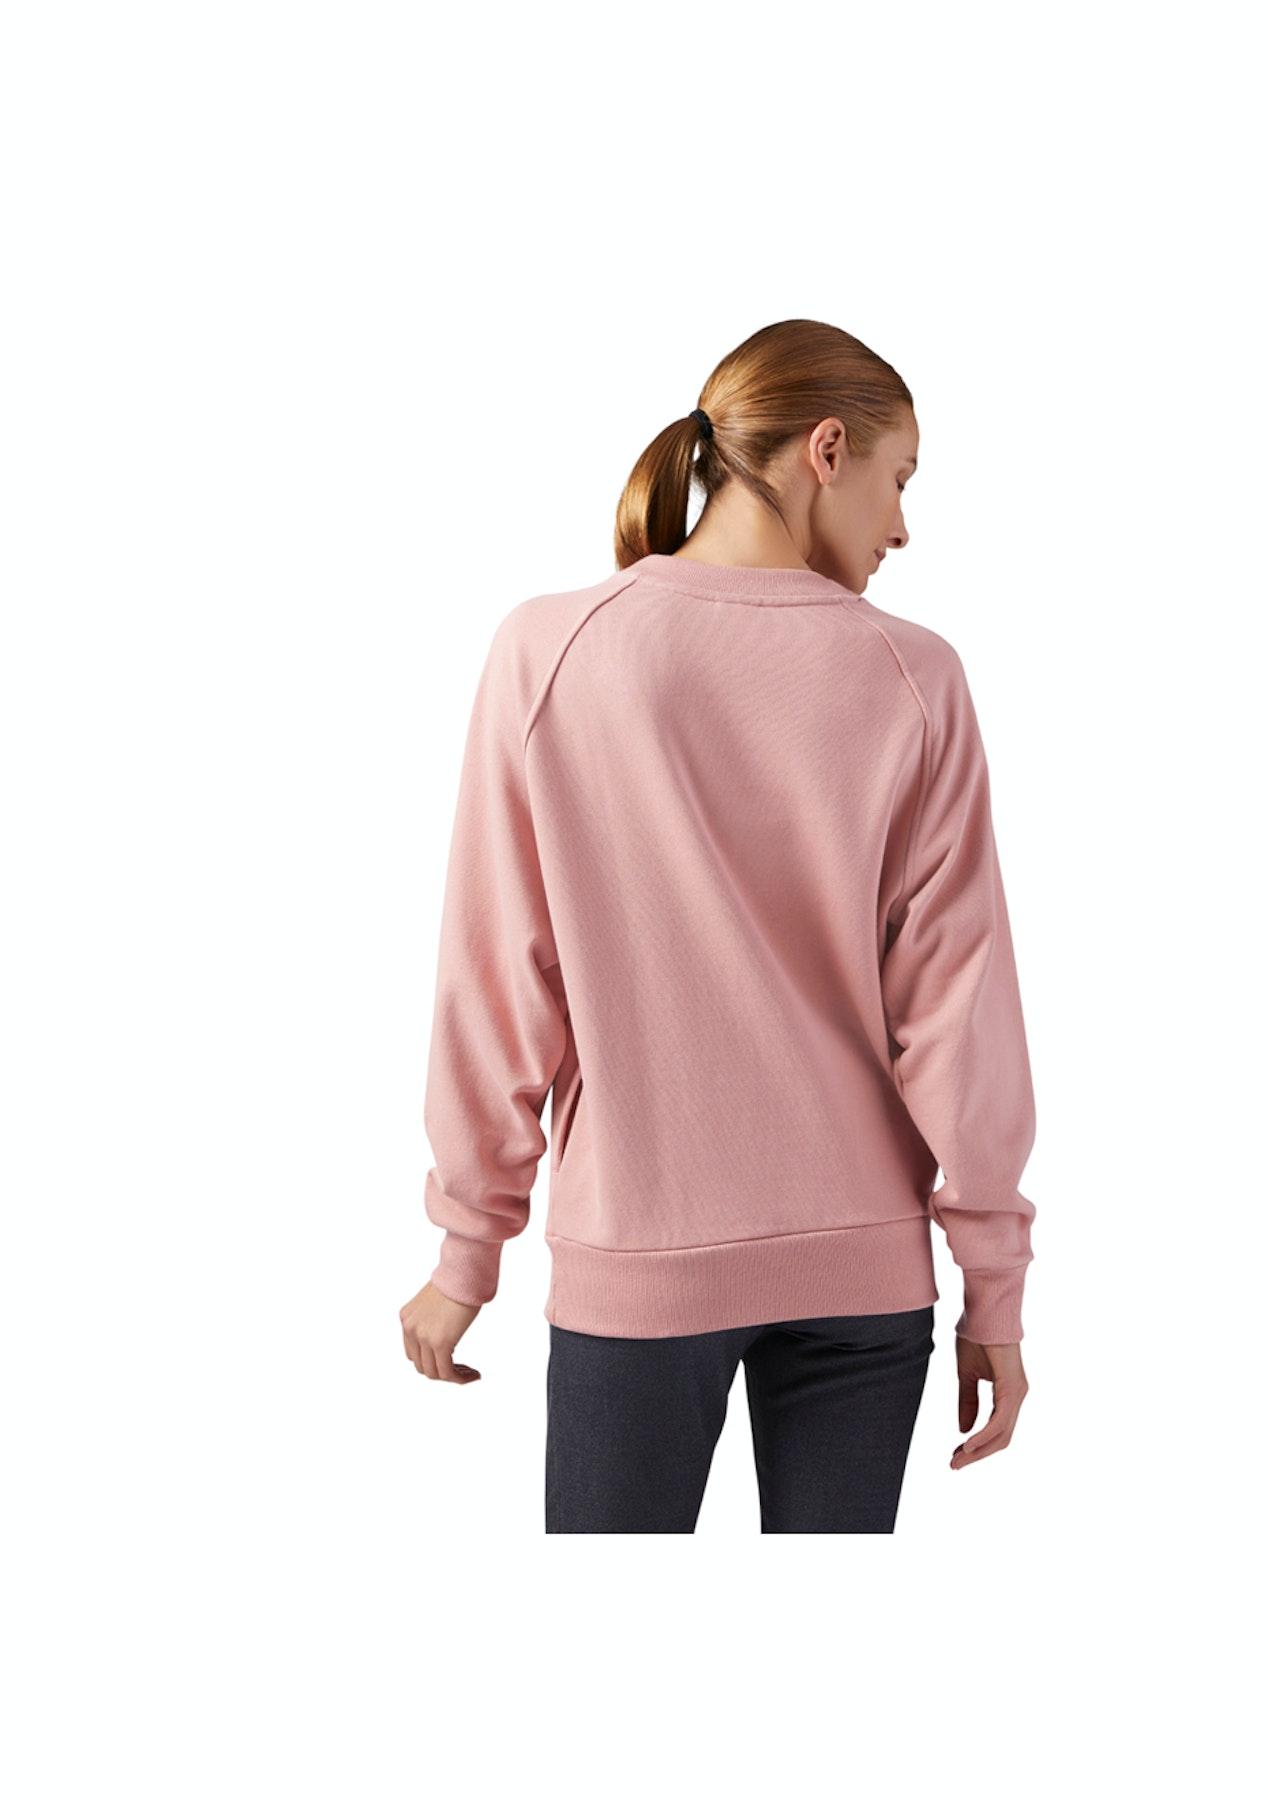 79fb3f2ed4f Reebok Womens - Lf Cotton Cover Up - Chalk Pink - Reebok - Onceit